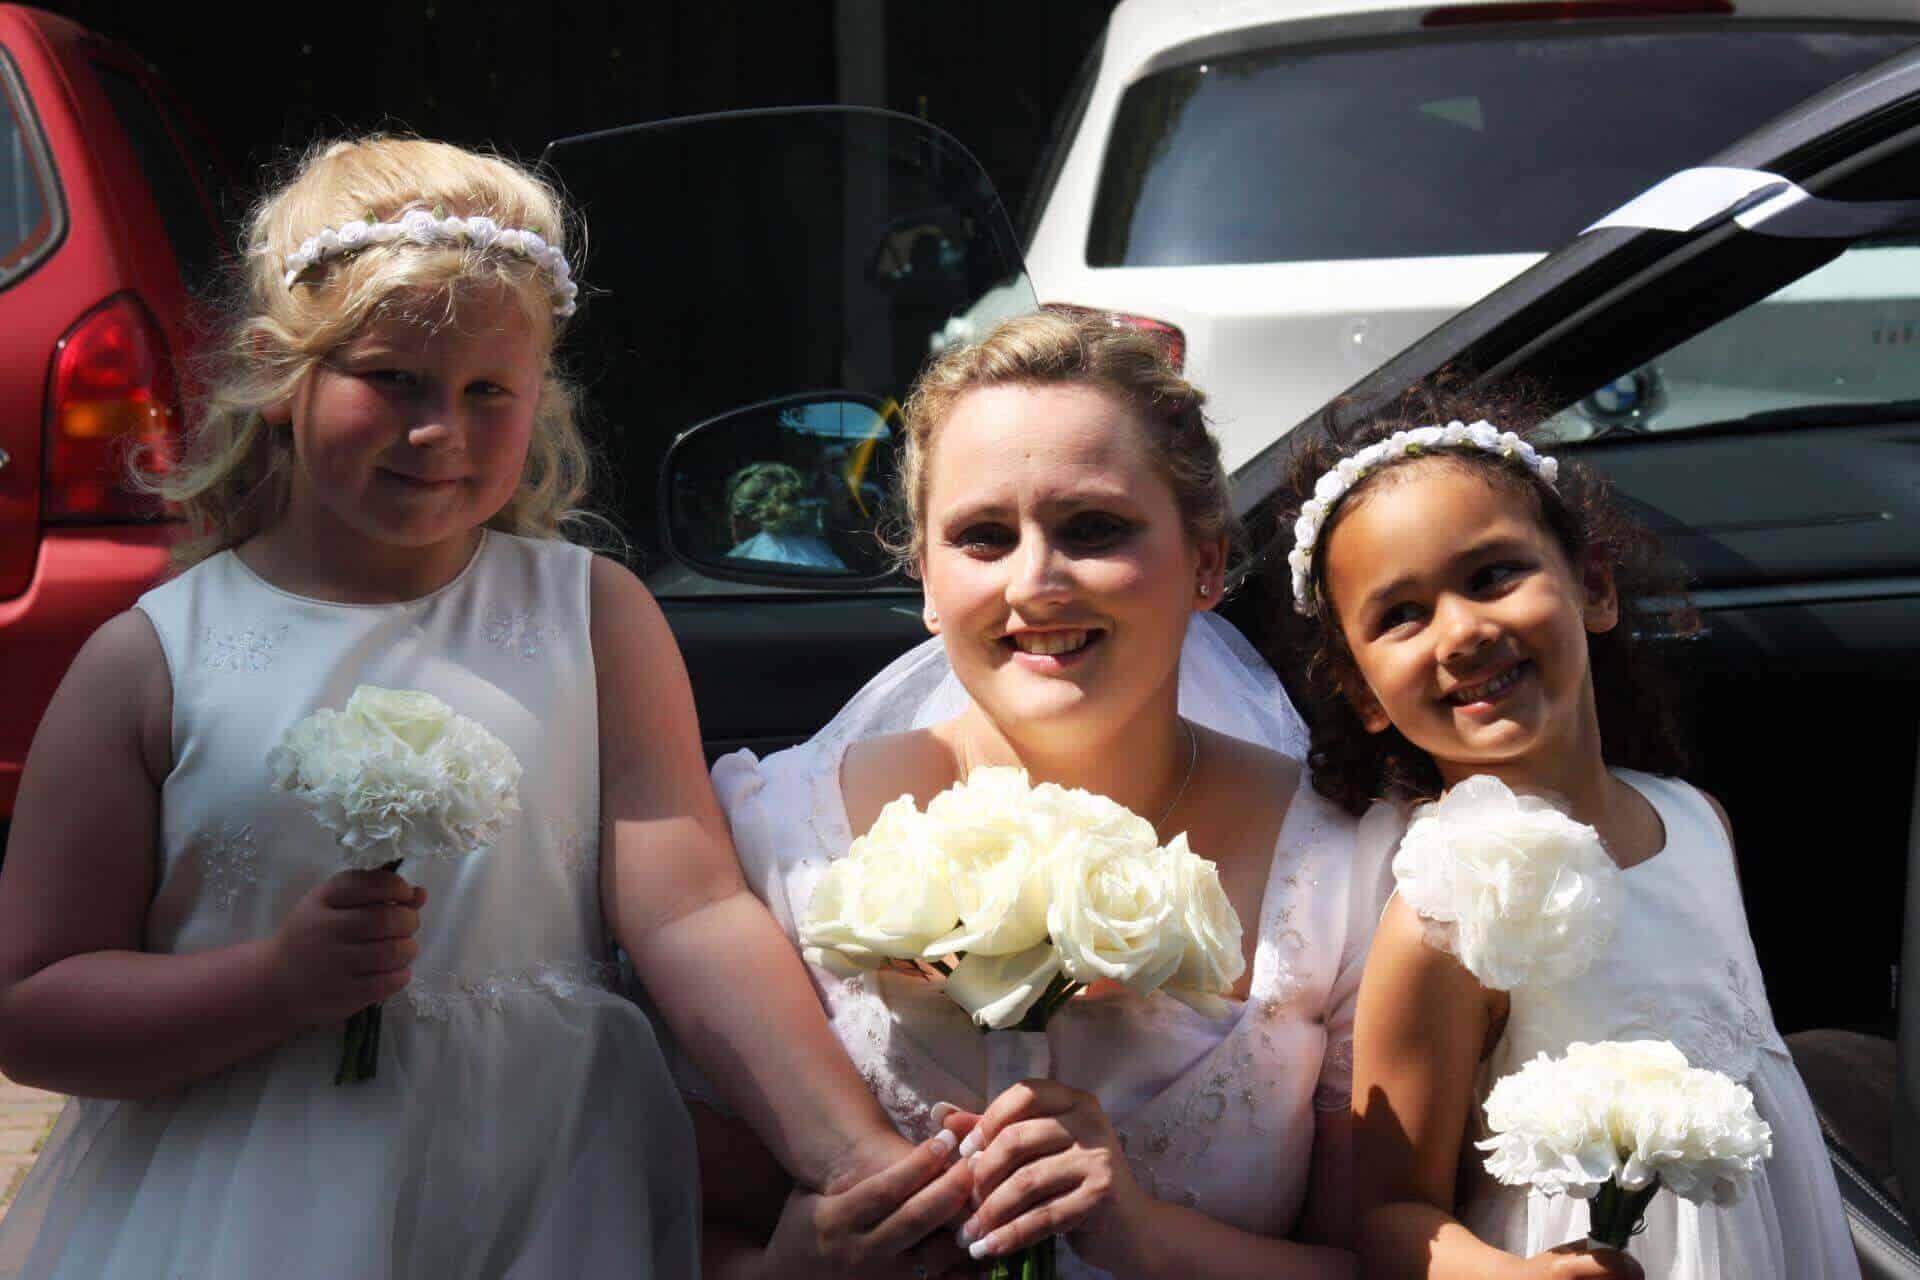 Wedding Photo angela and john milnes